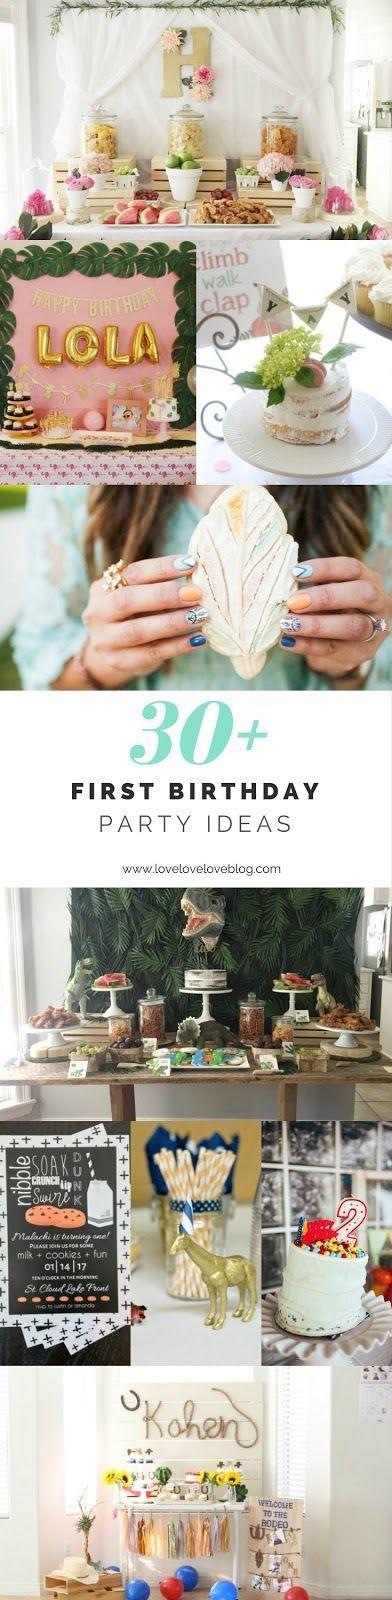 First birthday girl   first birthday boy   first birthday party ideas   first birthday party themes